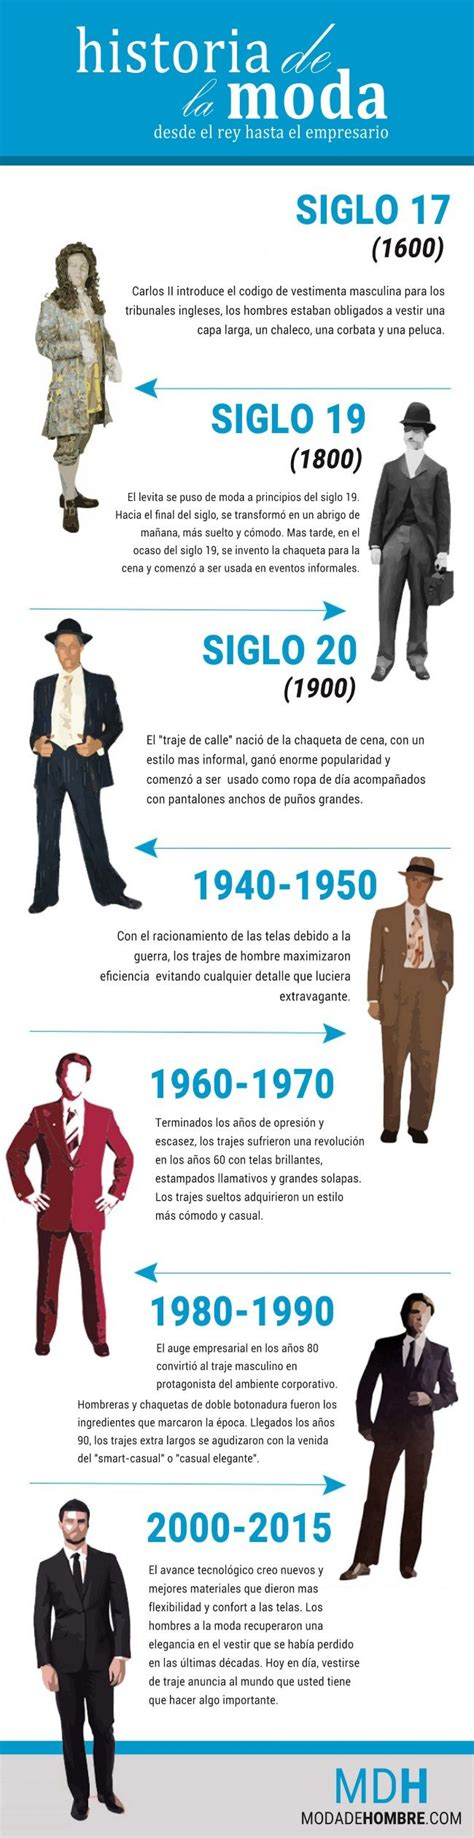 Infografia historia de la moda masculina | Historia de la moda